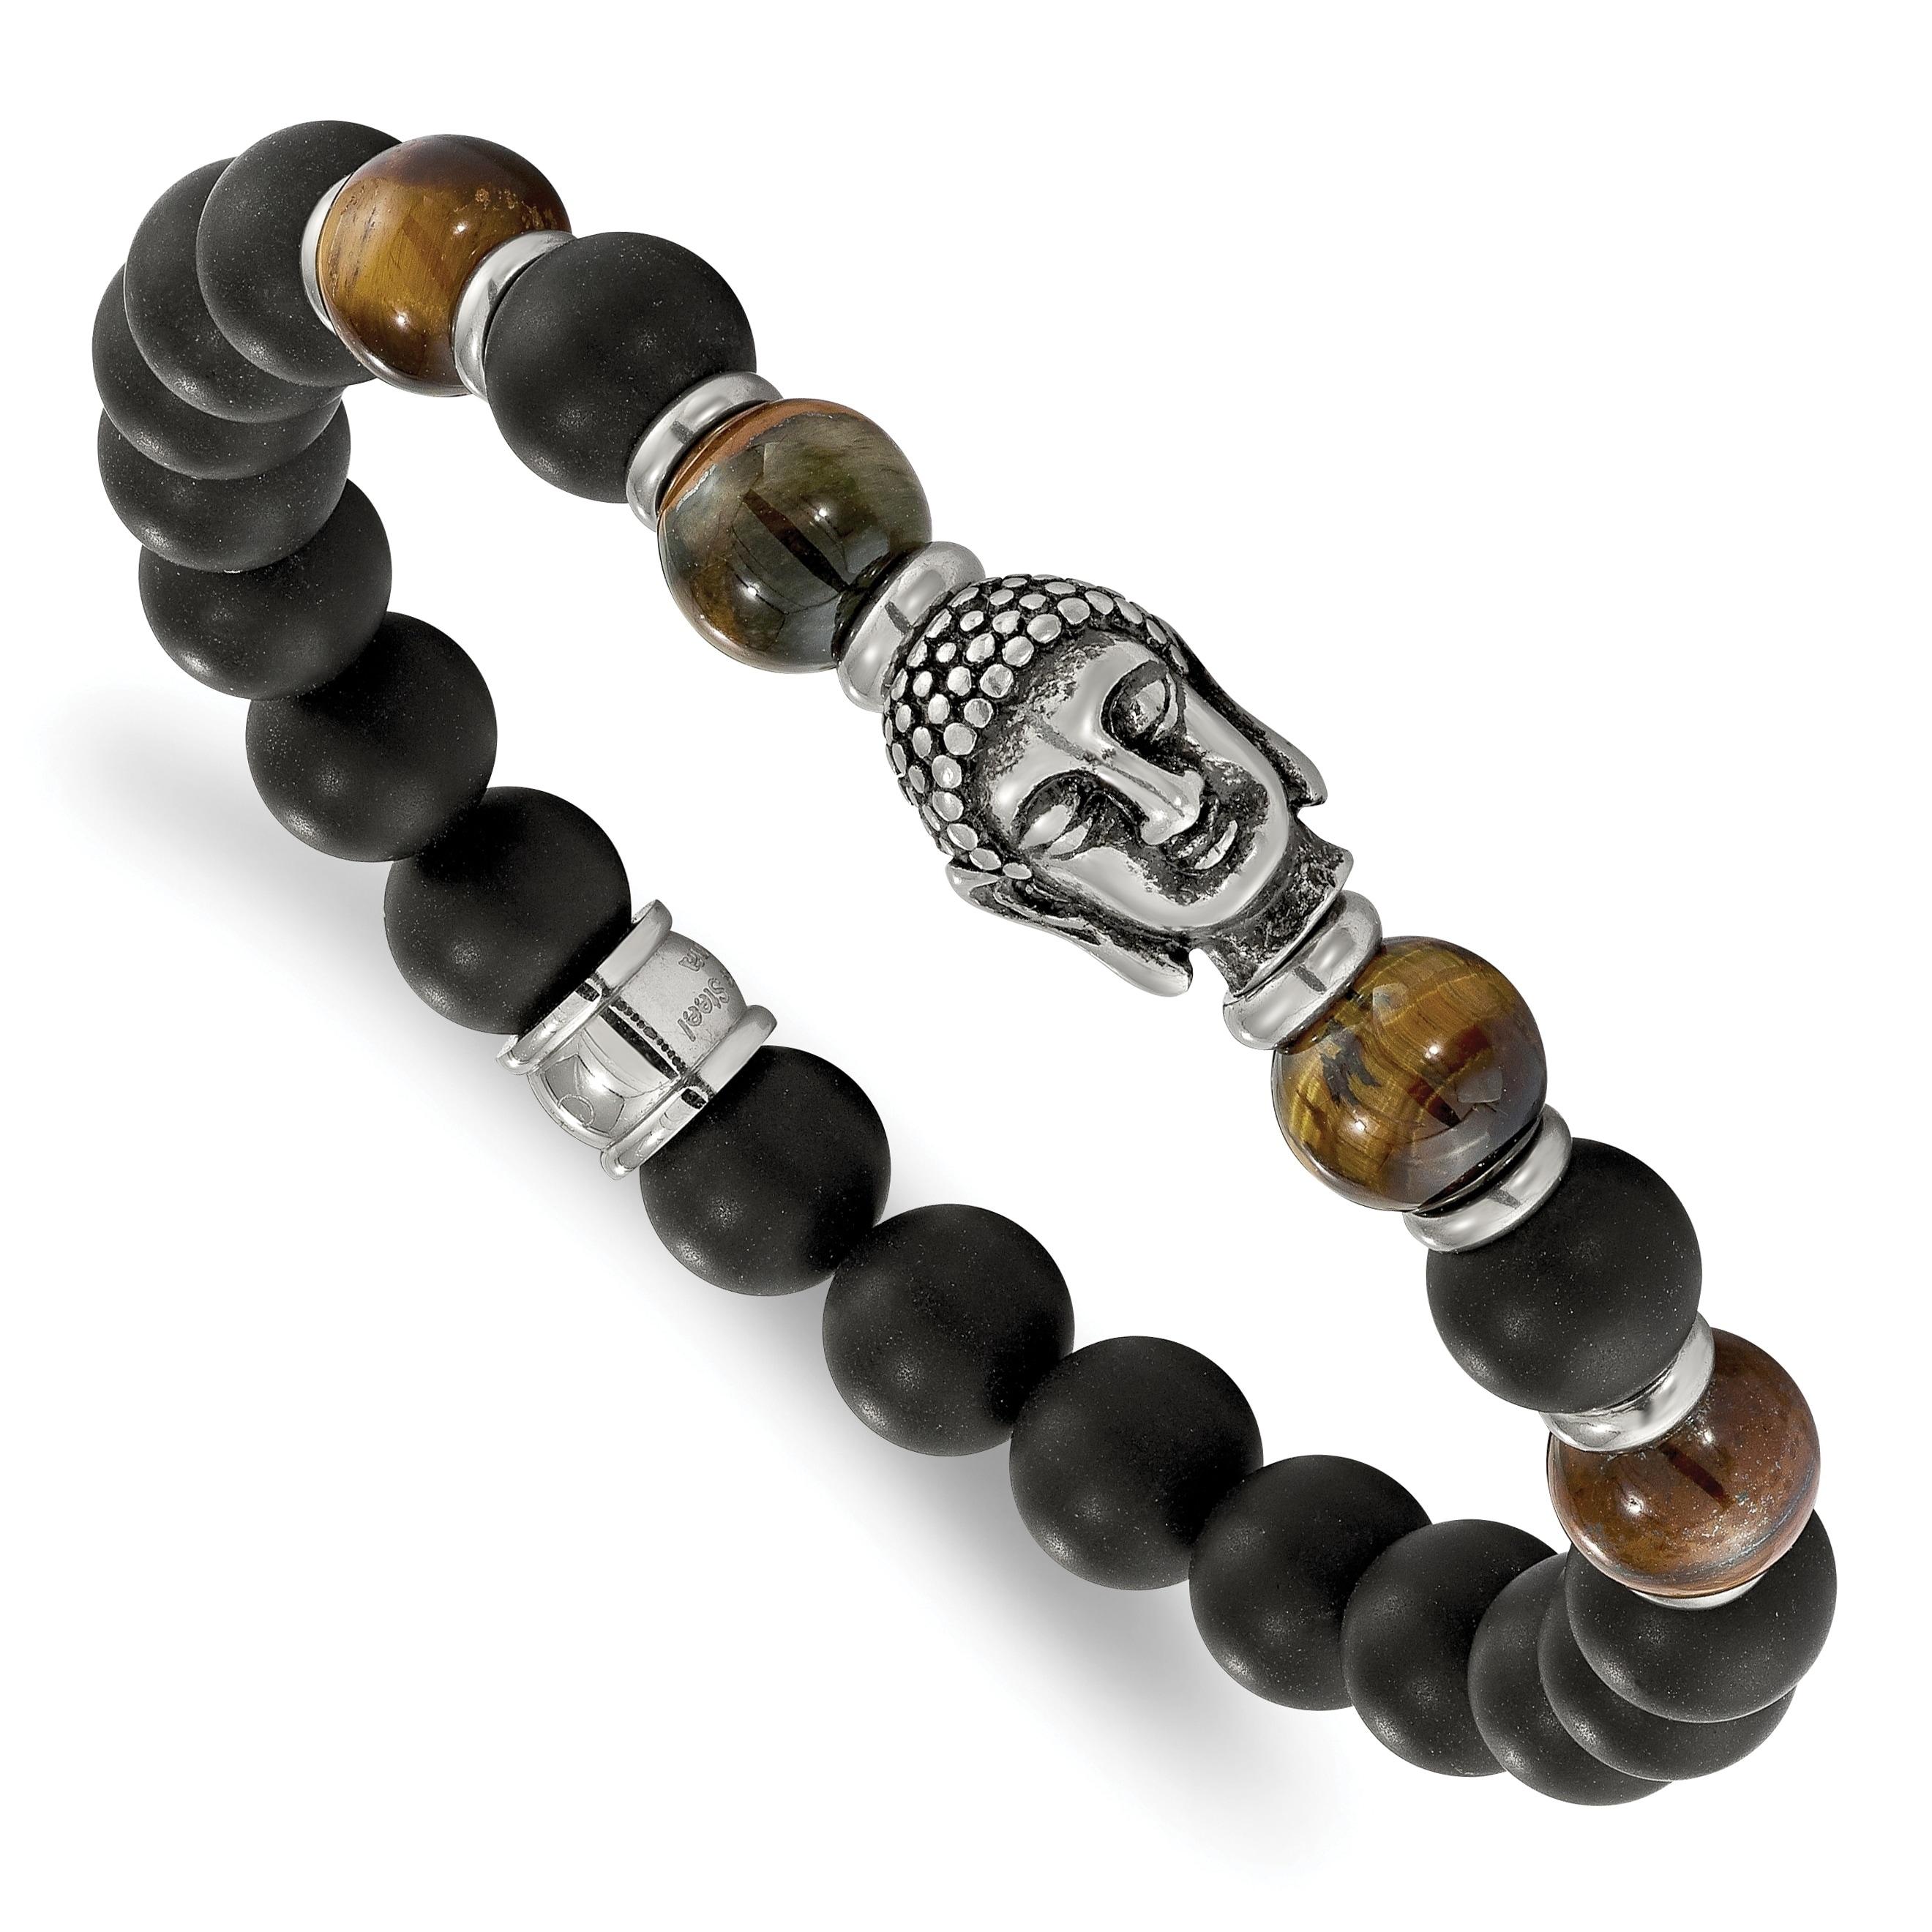 Black Agate Wrist Buddhism Lotus Buddhist Prayer Beads Stone Stretch Bracelet